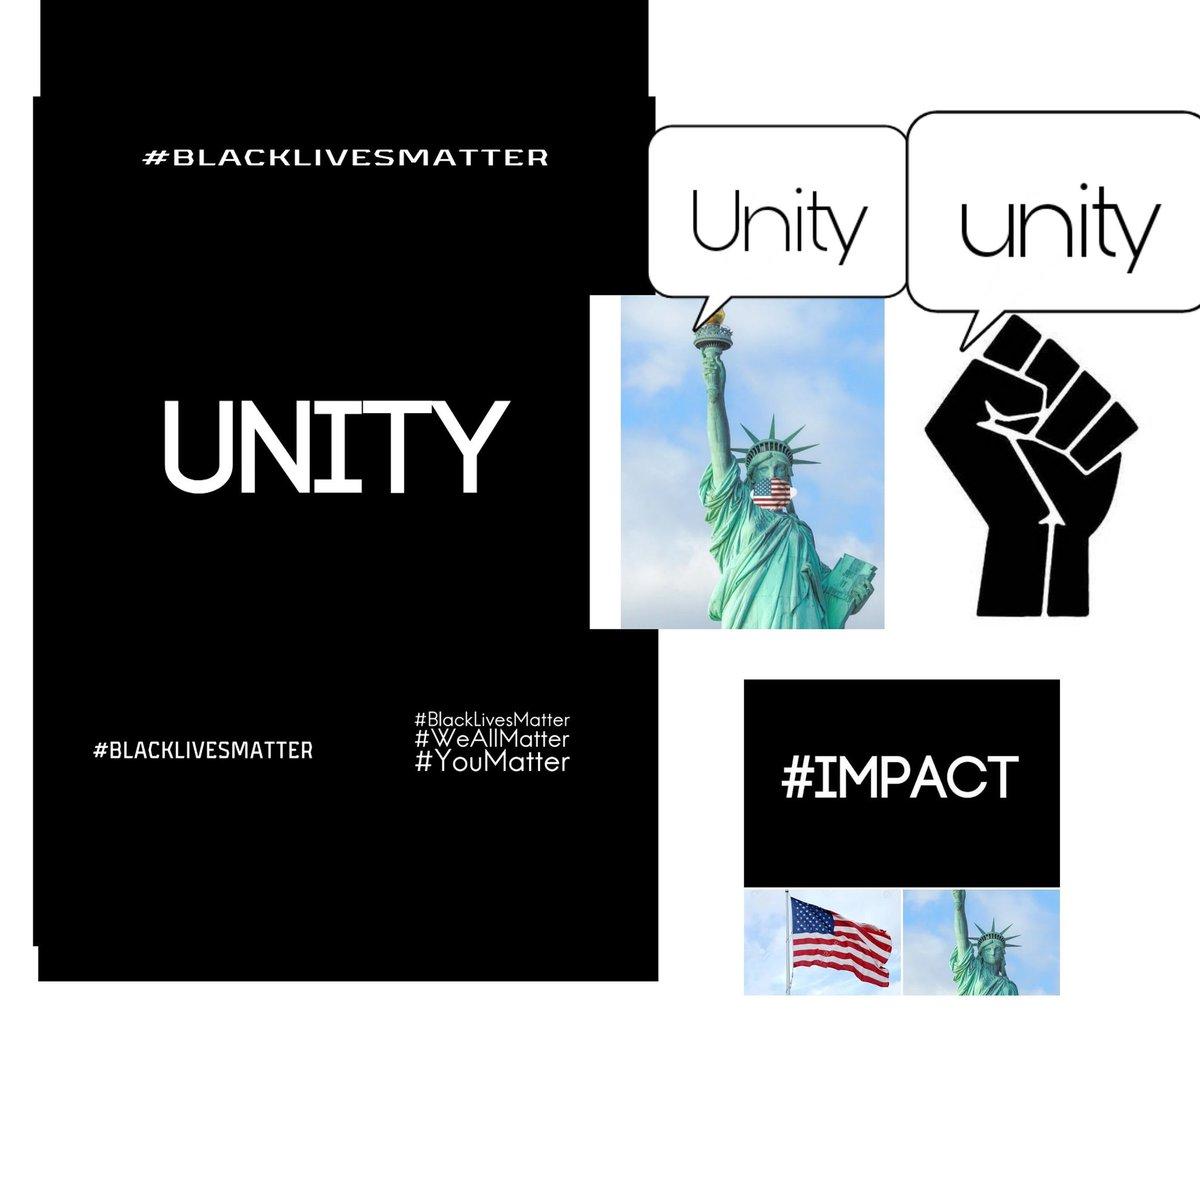 #Unity #wednesdaymorning #WednesdayWisdom #WednesdayThoughts #WednesdayMotivation #BlackLivesMatter #Impact @bannerite @MzDivah67 @AuntLulie @Amaliada @GGevirtz @scyeatts @MrGoalie35 @Murray_RileyJr @jimmacpam @NaphiSoc @Bullets_4_Life